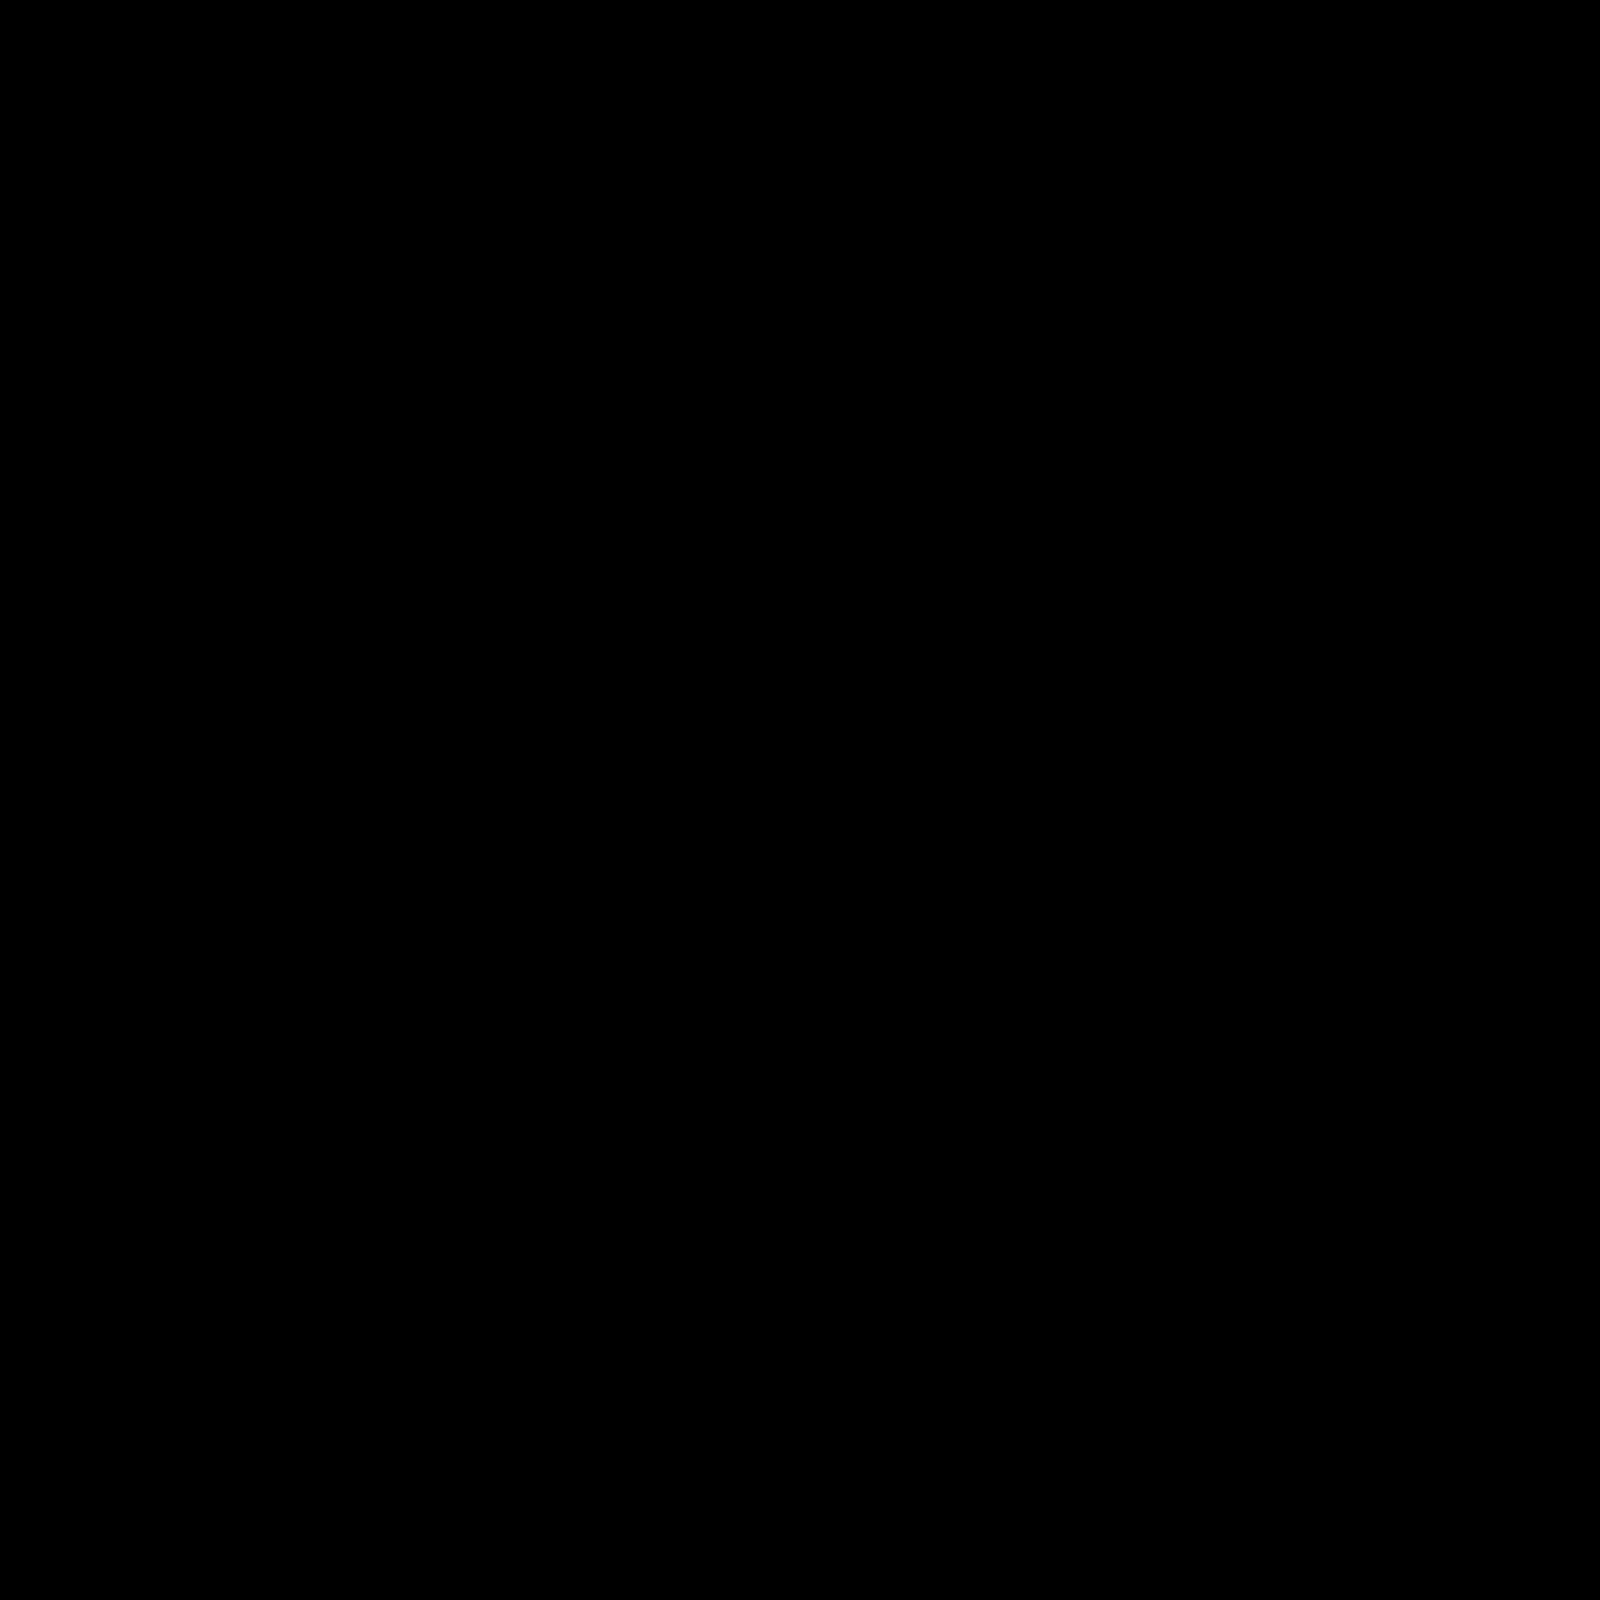 Student Center icon